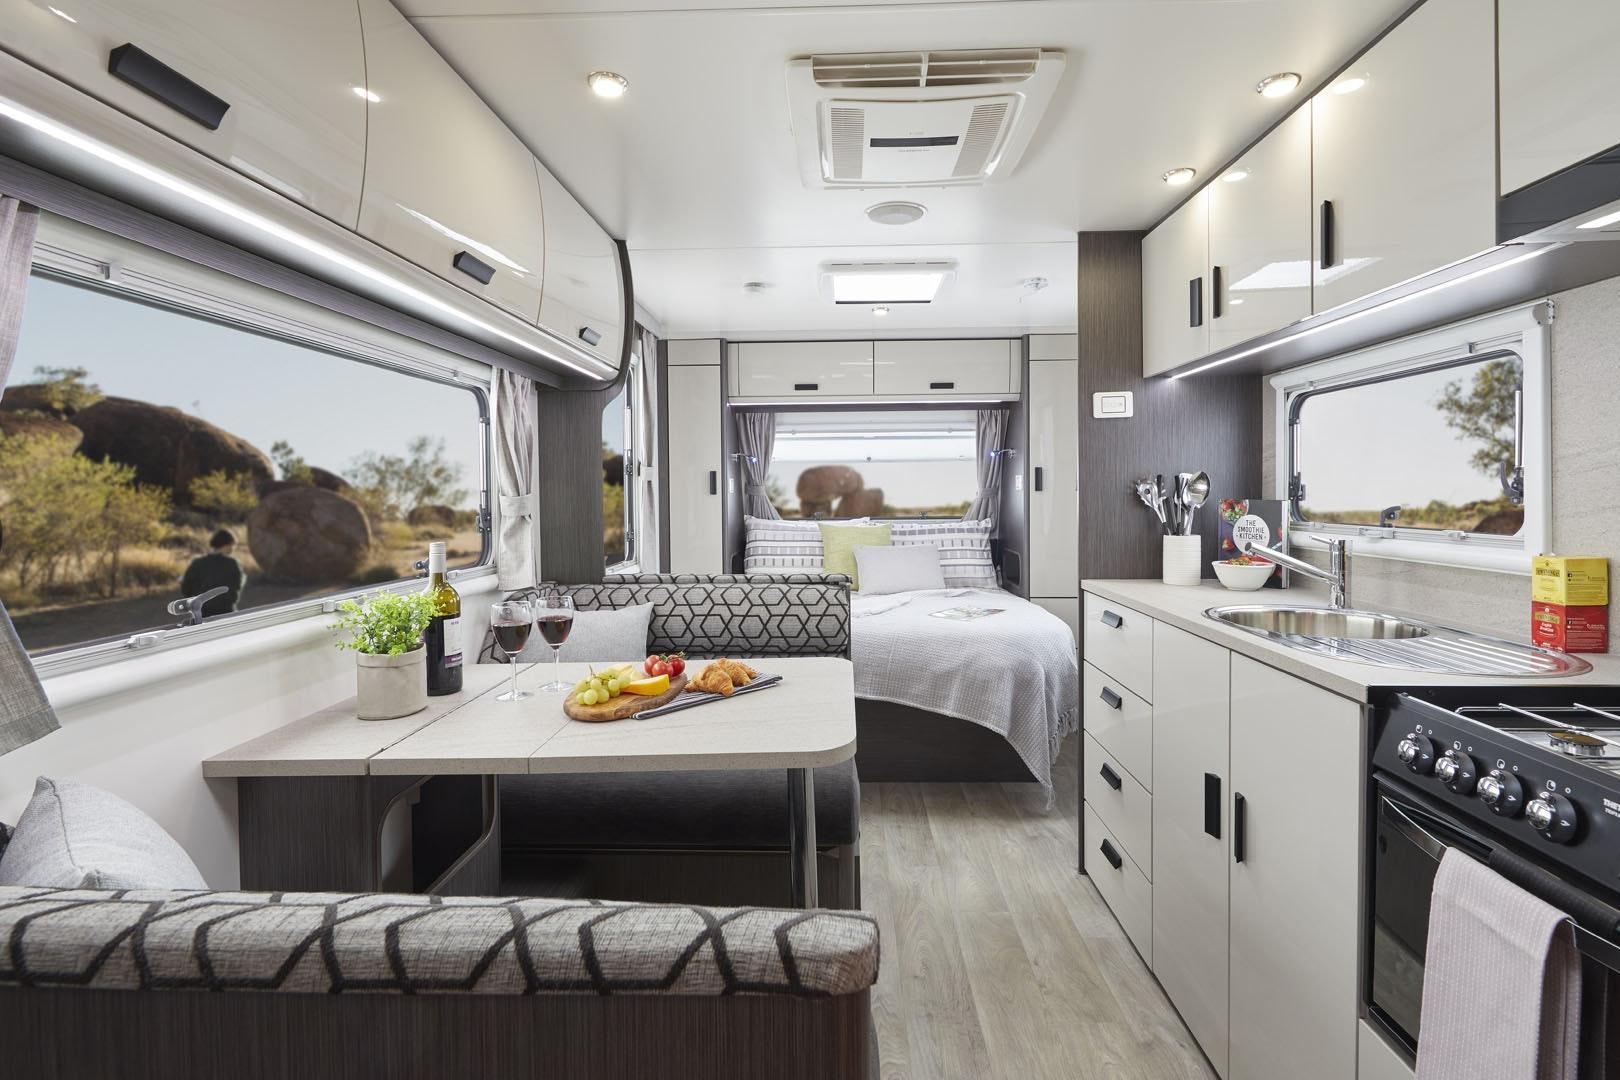 S2p0tY bIbsPYZIoD30mYcWVM - 2020 Jayco Caravans